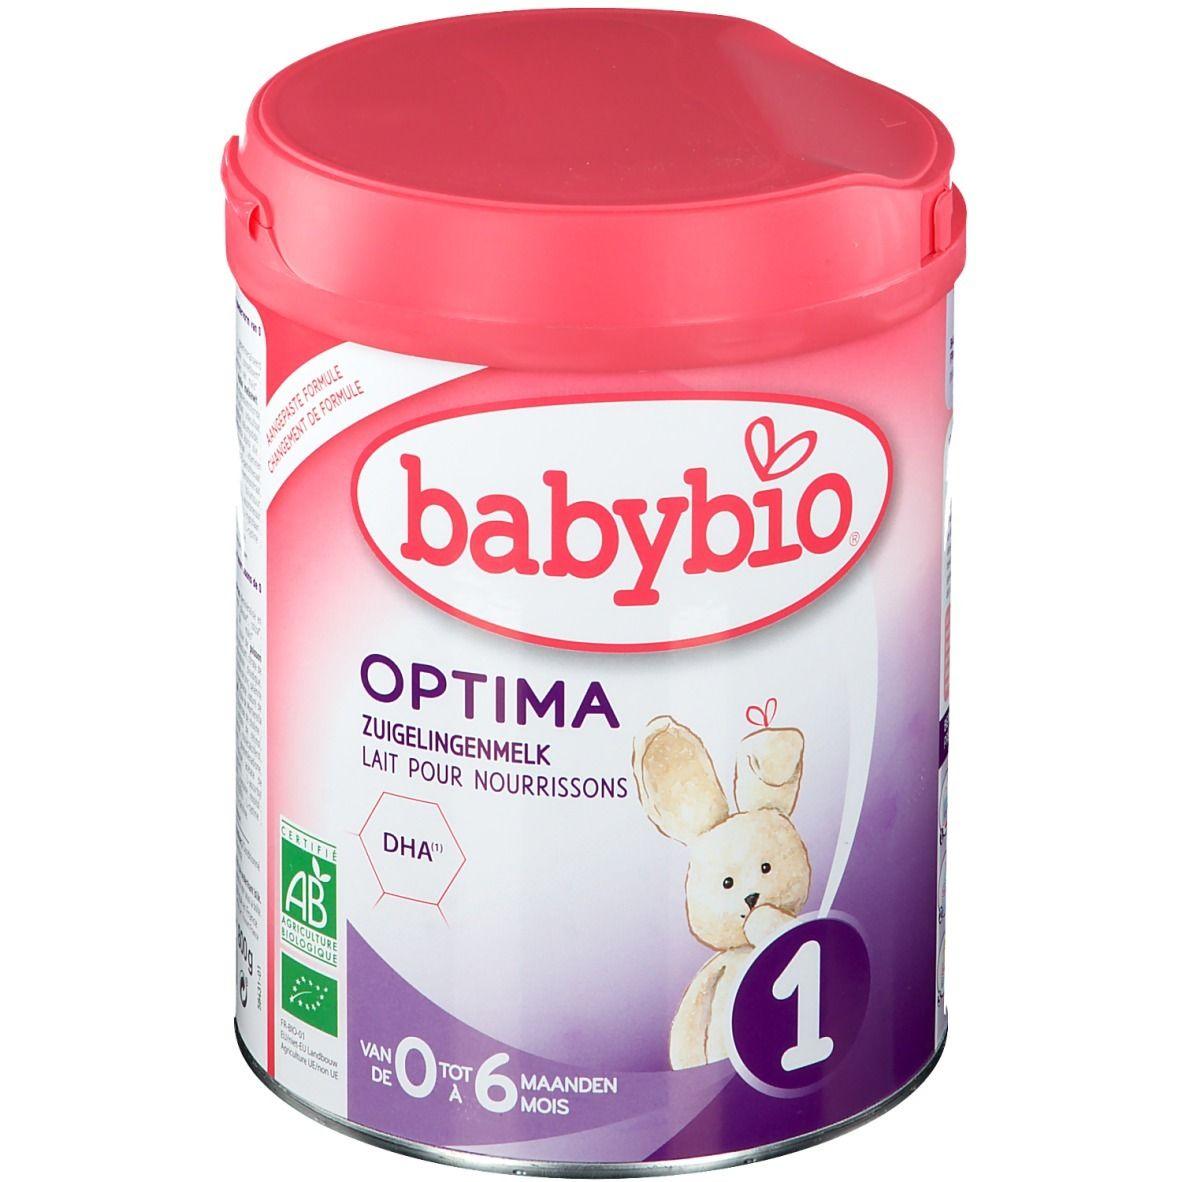 Image of BABYBIO OPTIMA 1 SÄUGLINGSMILCH 0-6 MONATE